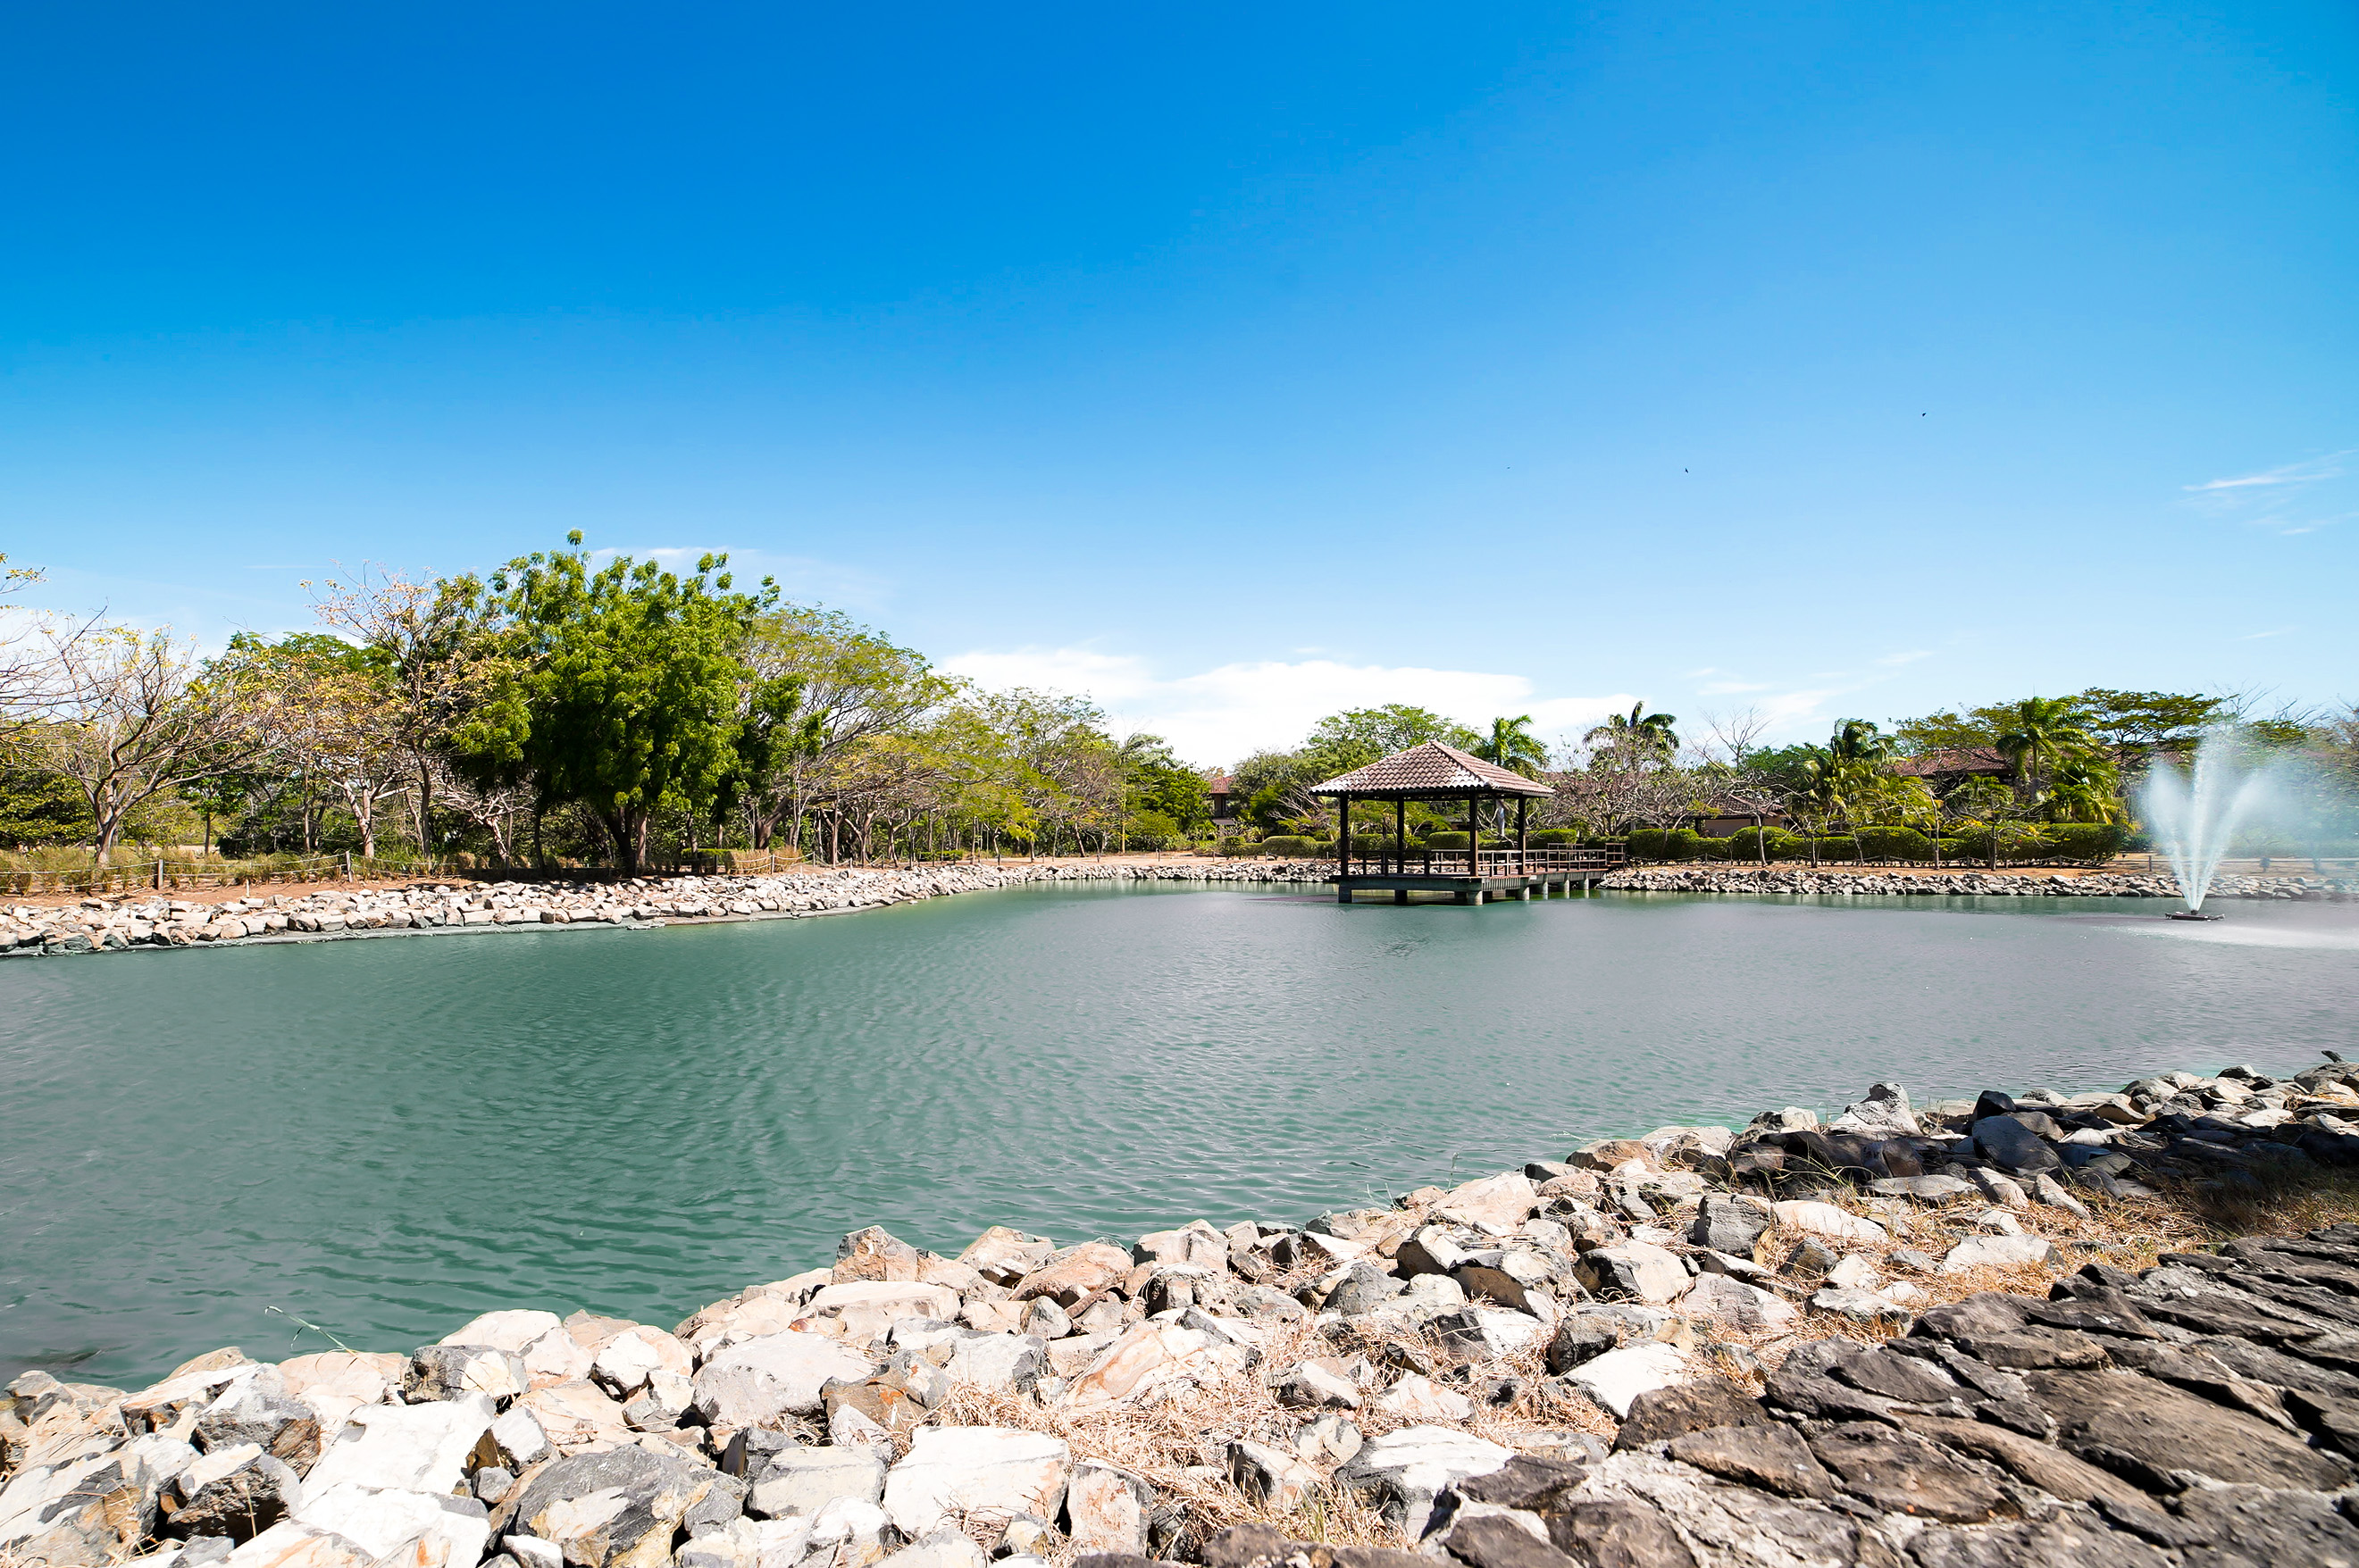 Beautiful view of the lake